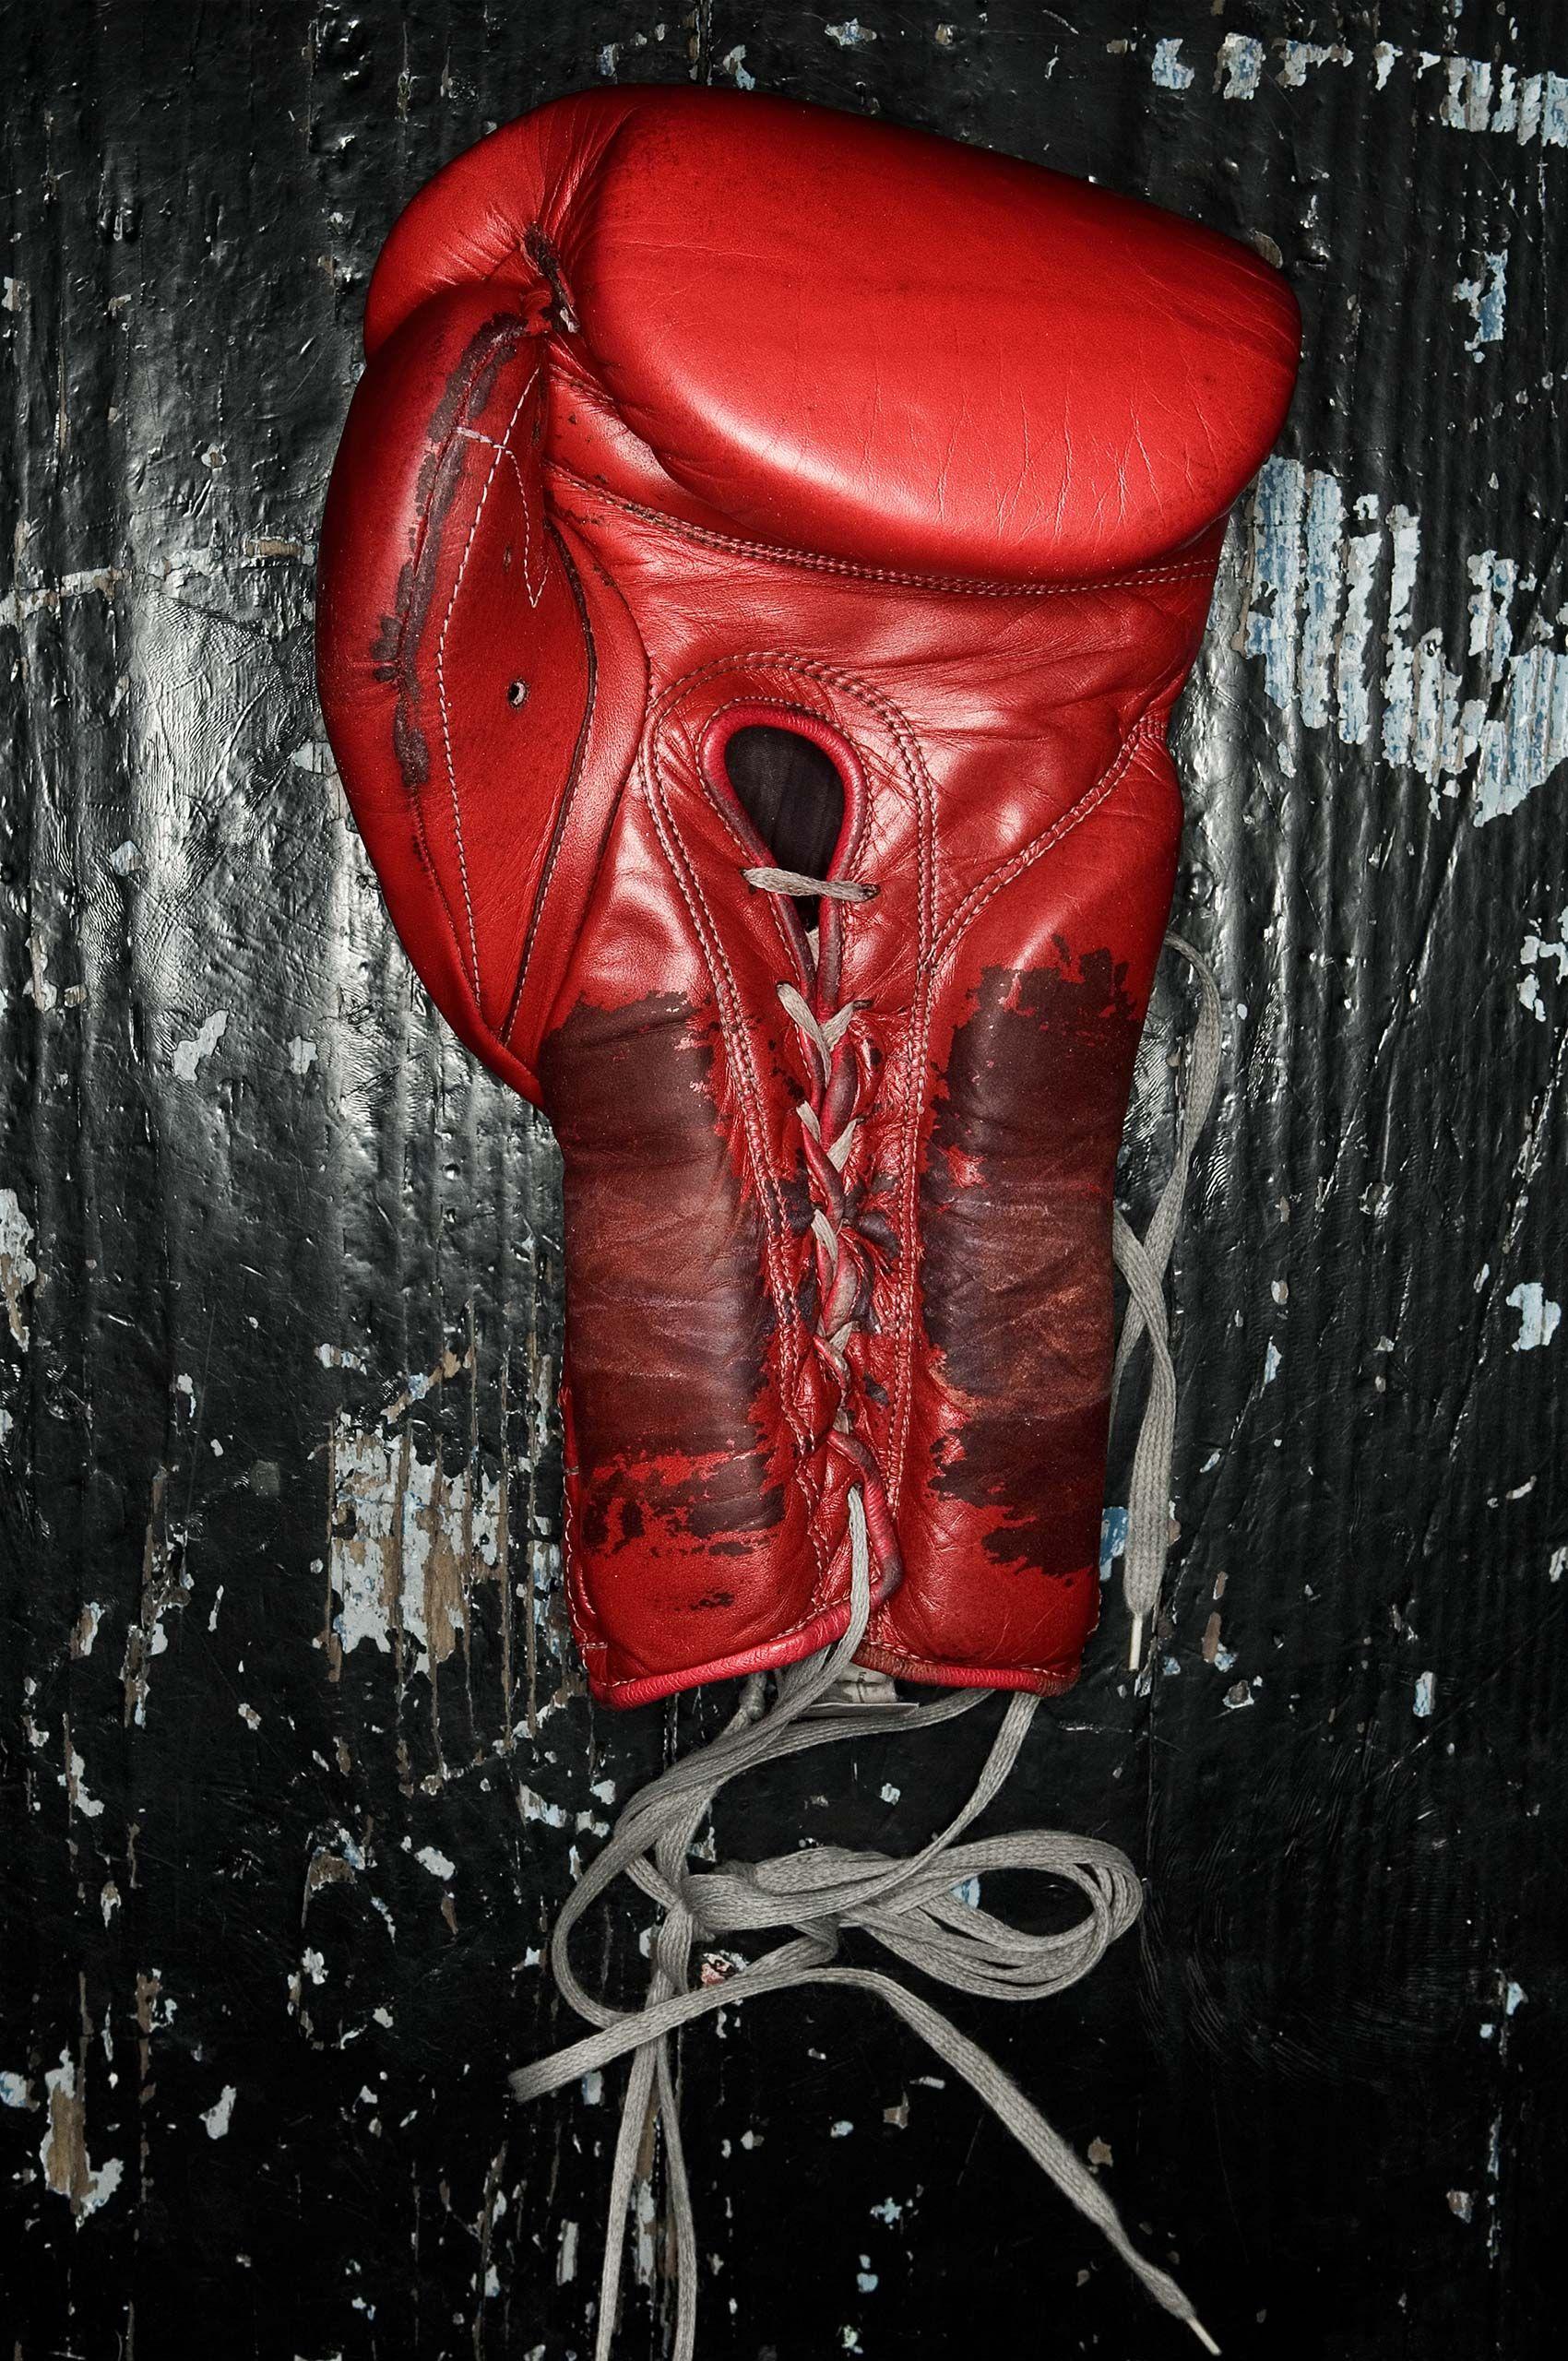 Boxing-glove-HenrikOlundPhotography.jpg